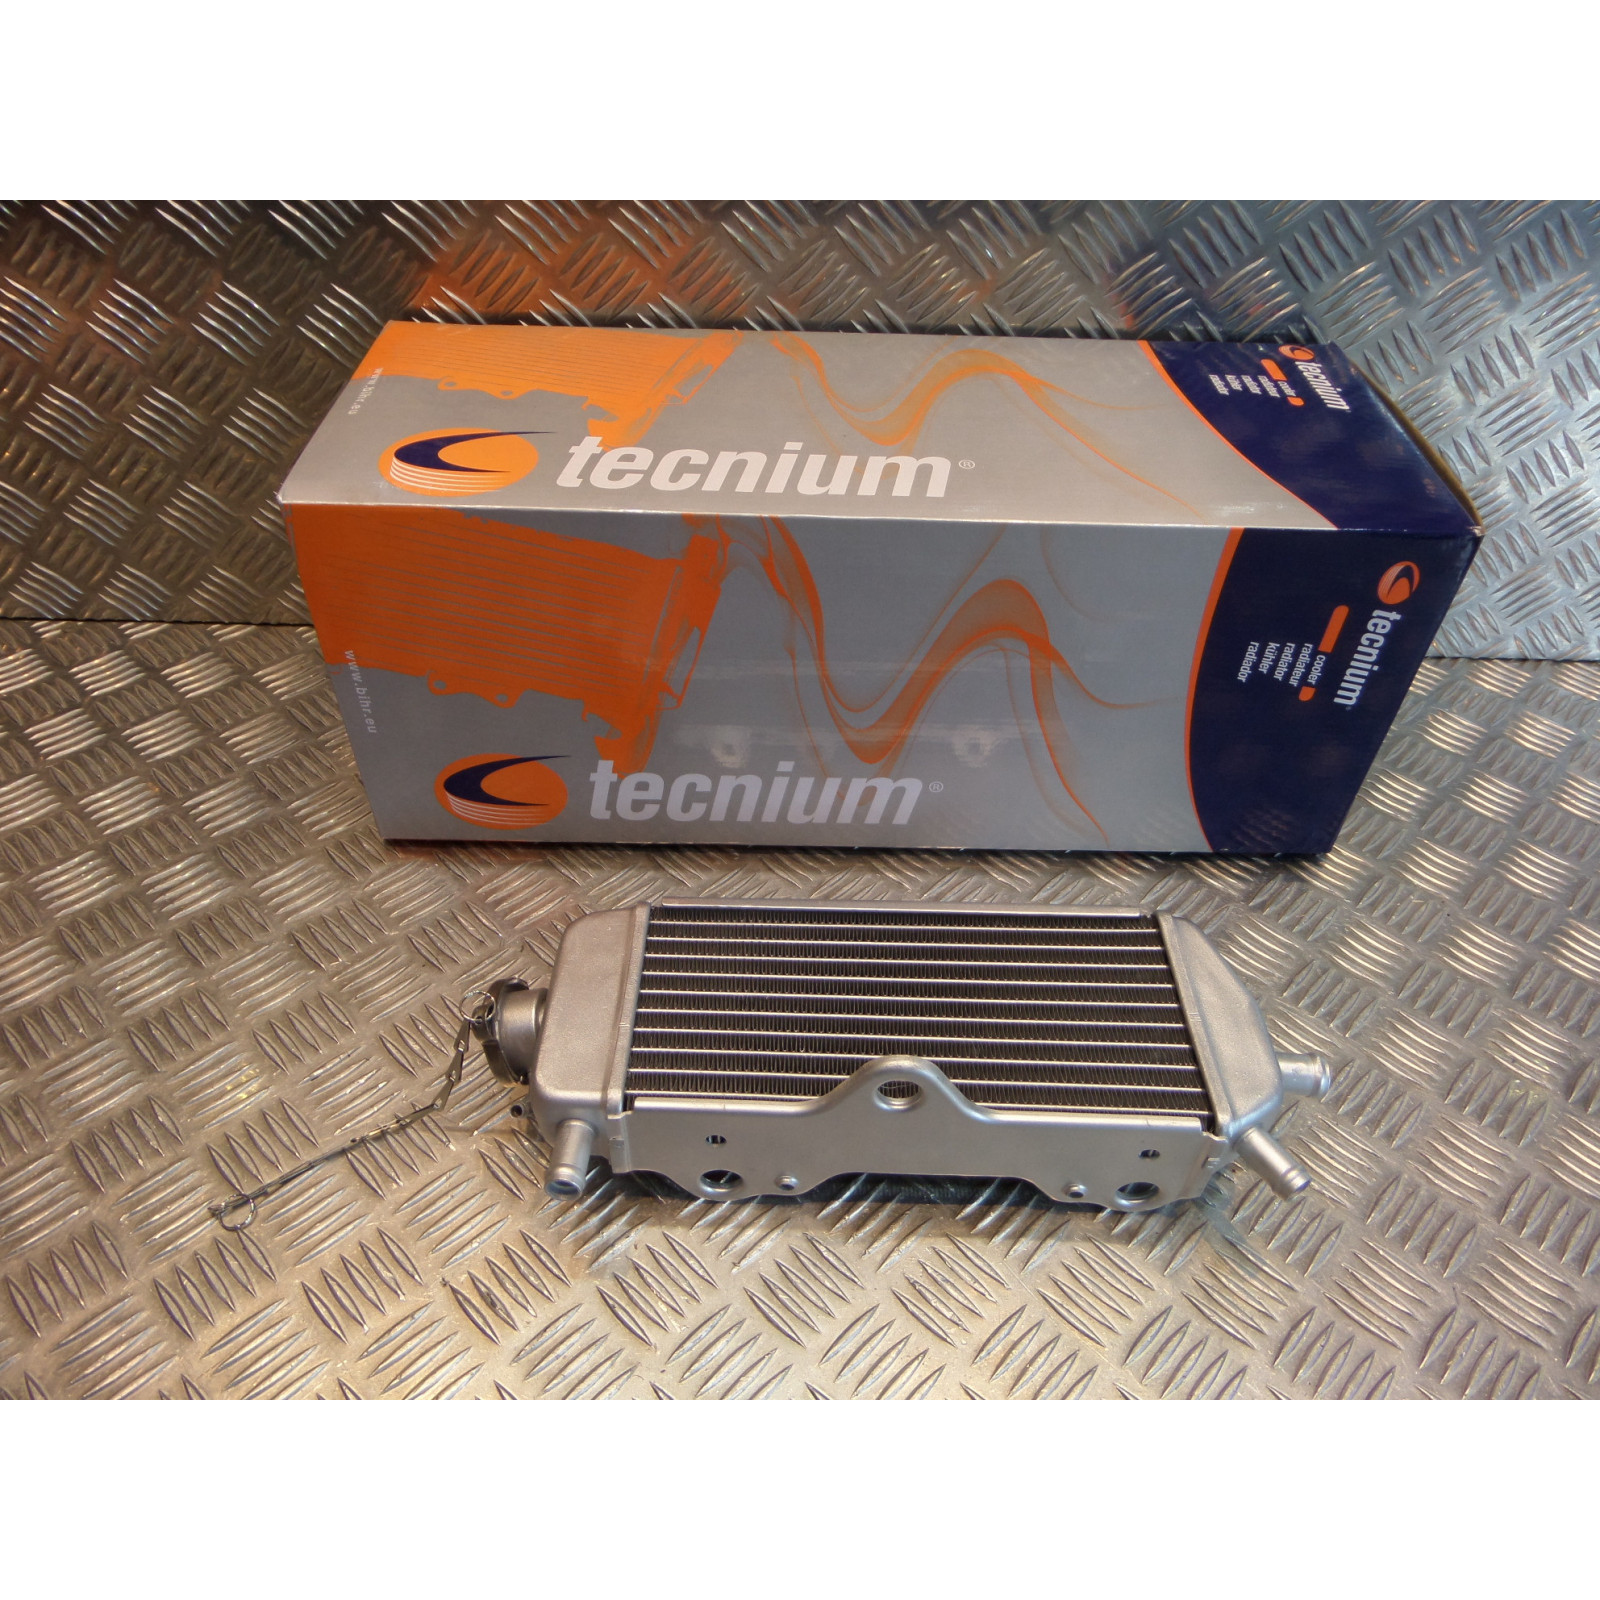 radiateur eau droit tecnium b61a-ml moto yamaha yz 125 2005 - 20 bihr 960051